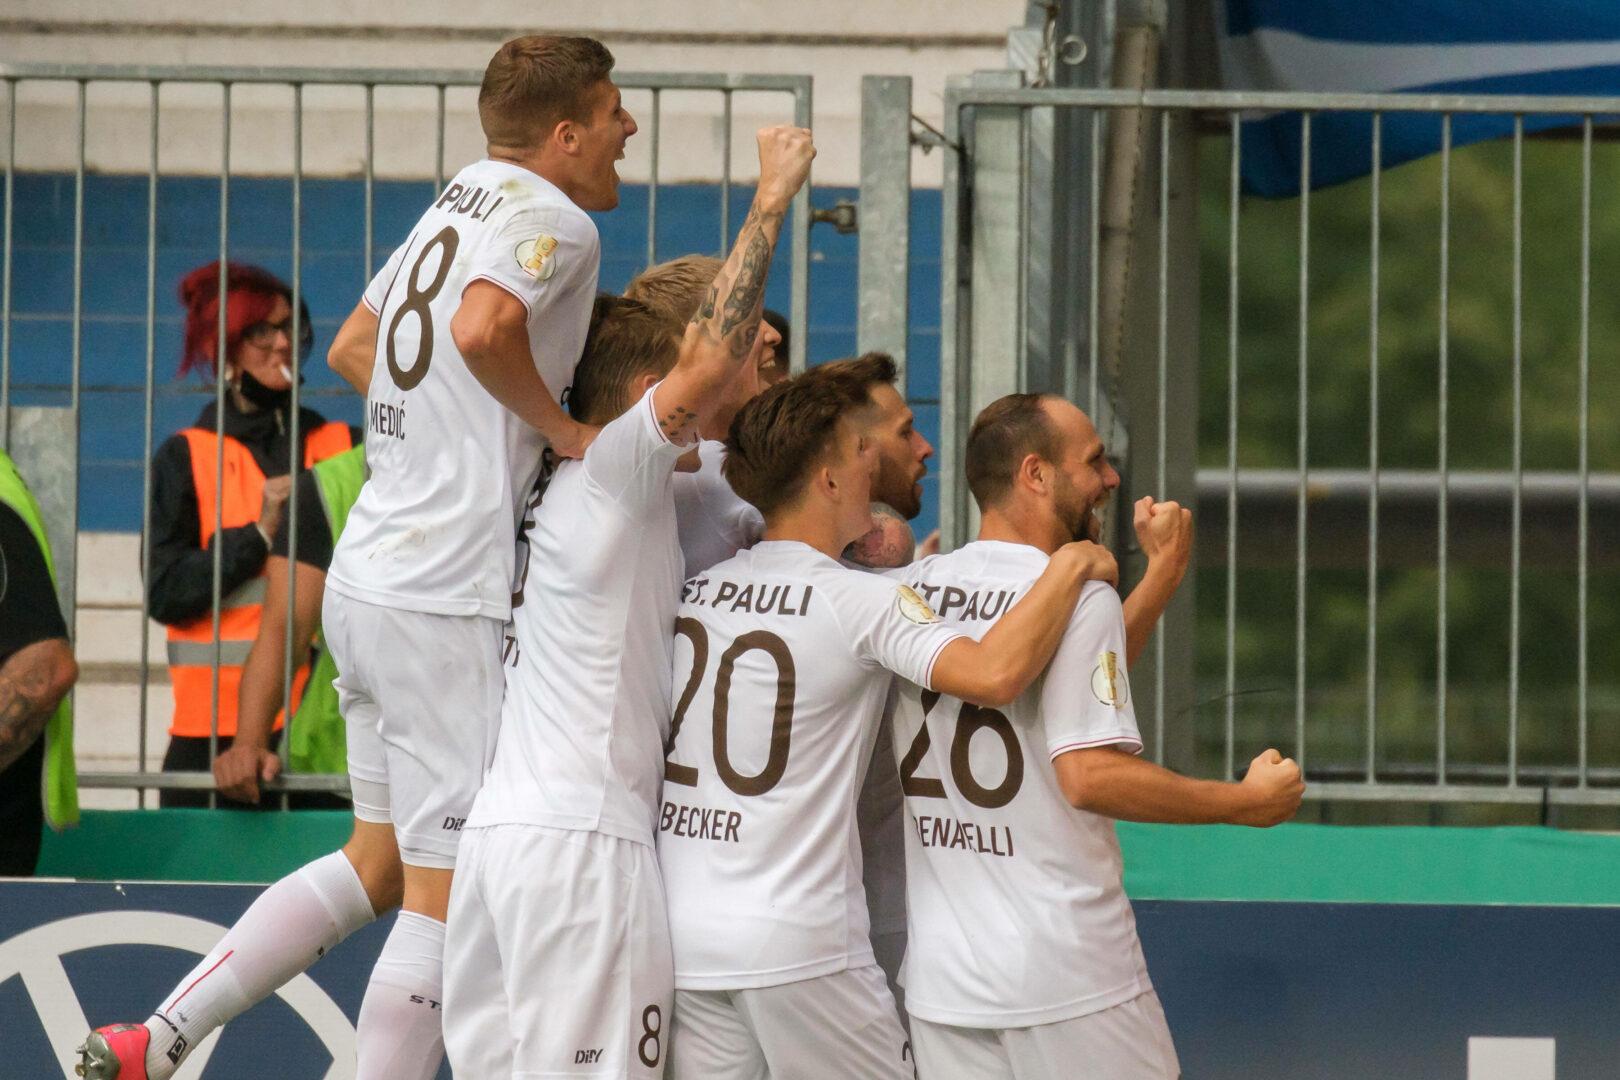 DFB-Pokal: St. Pauli übersteht Pokalfight, Babelsberg wirft Fürth raus!